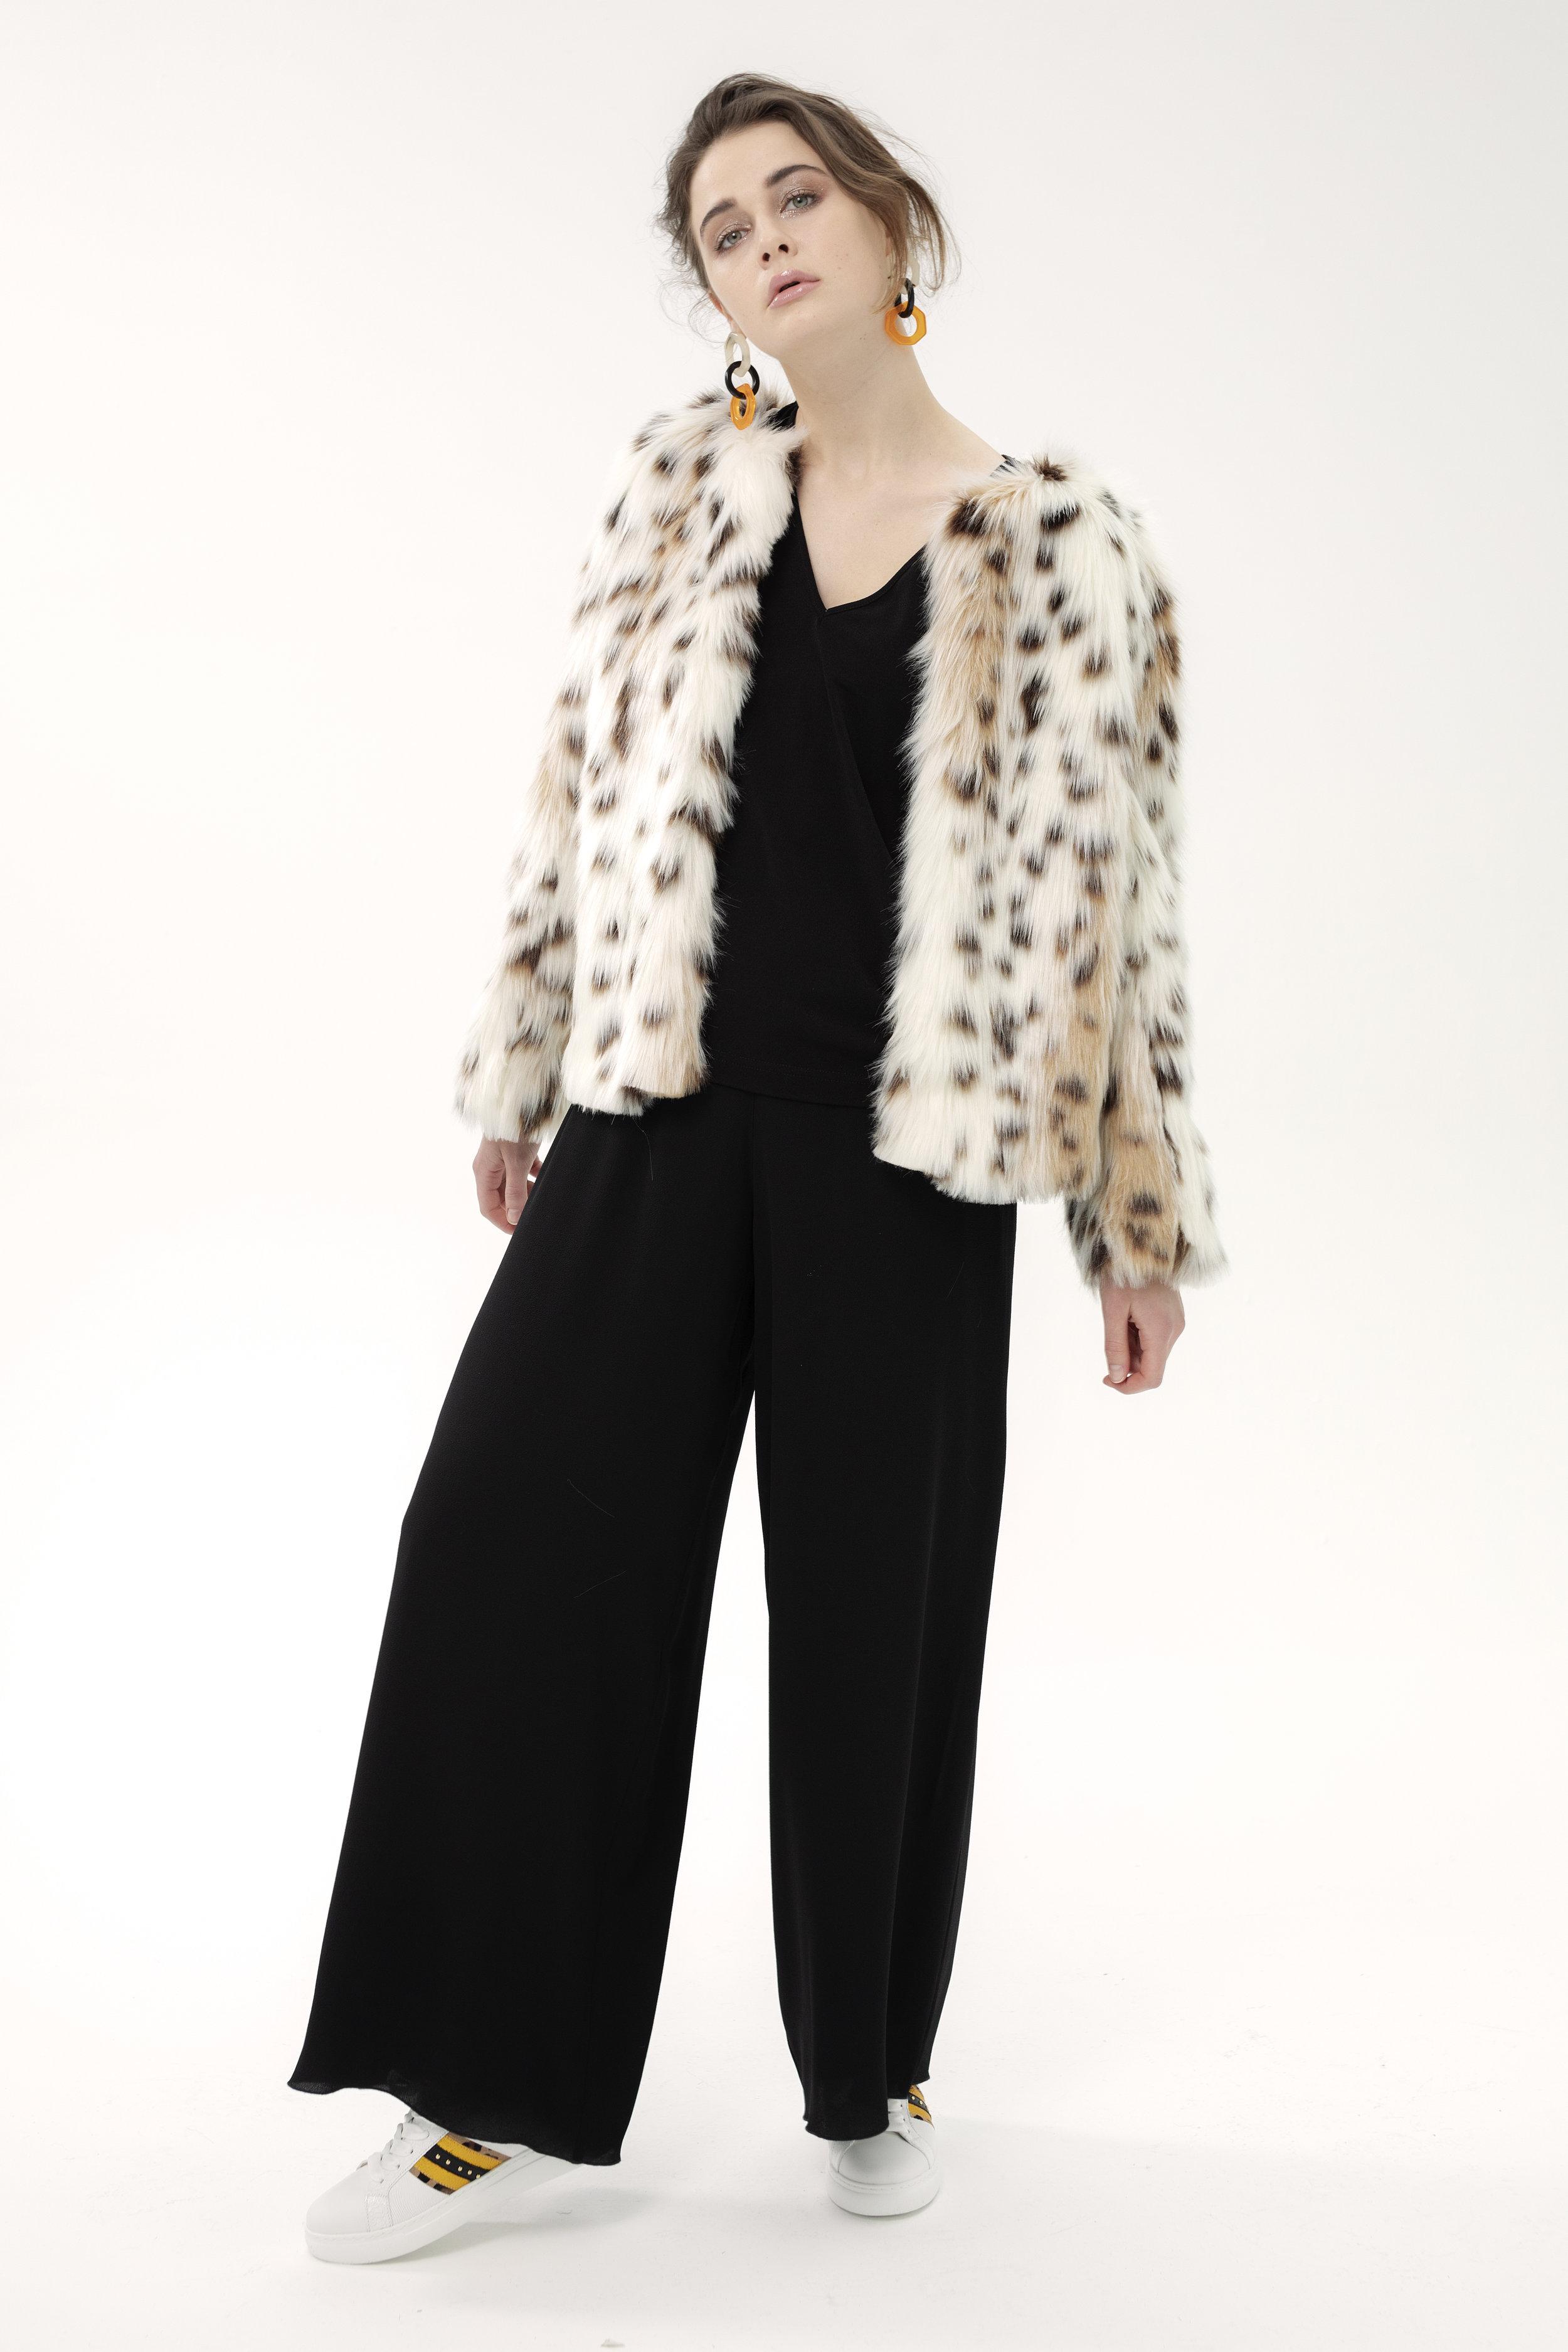 T Shirt MARSEPAN - milva | Jacket BEL - bobcat | Trouser NOUGATINE - crepe